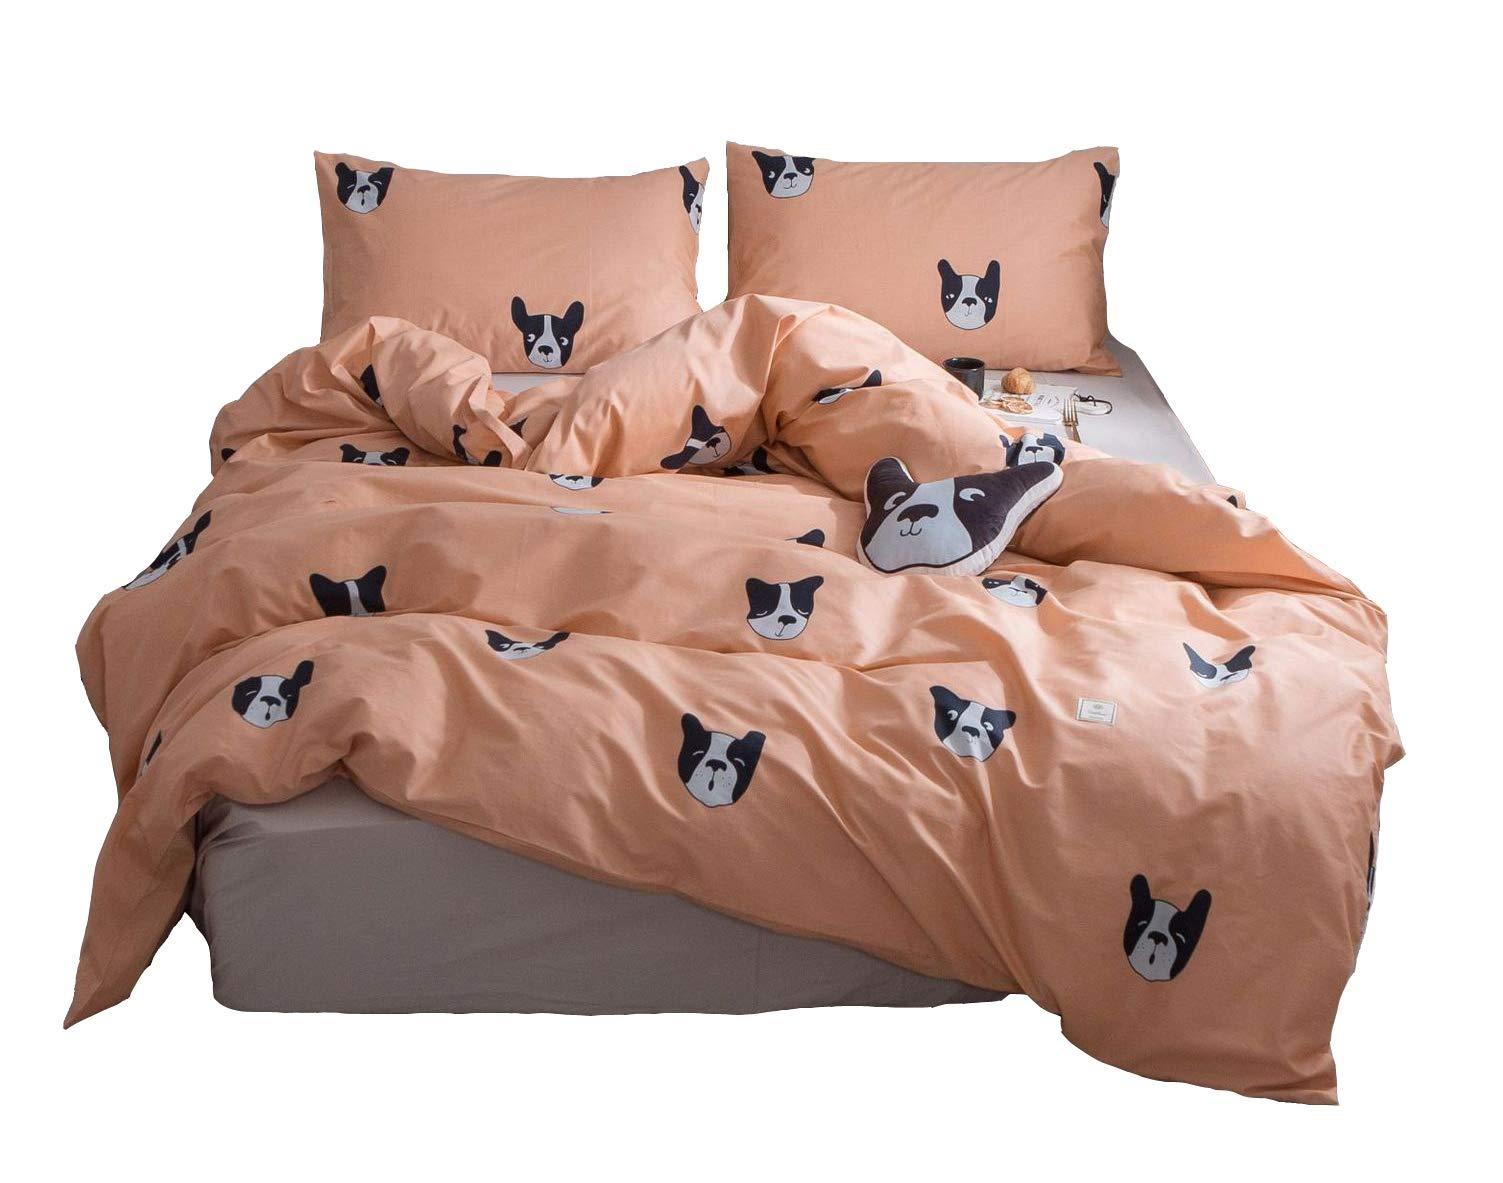 Cozydecor Queen Duvet Cover Set Kids Bedding Set Cartoon Animals Dog Print Cotton Bedding Duvet Cover 3 Piece Teens Boys Girls Comforter Cover with 2 Pillowcases Zipper Closure Corner Ties